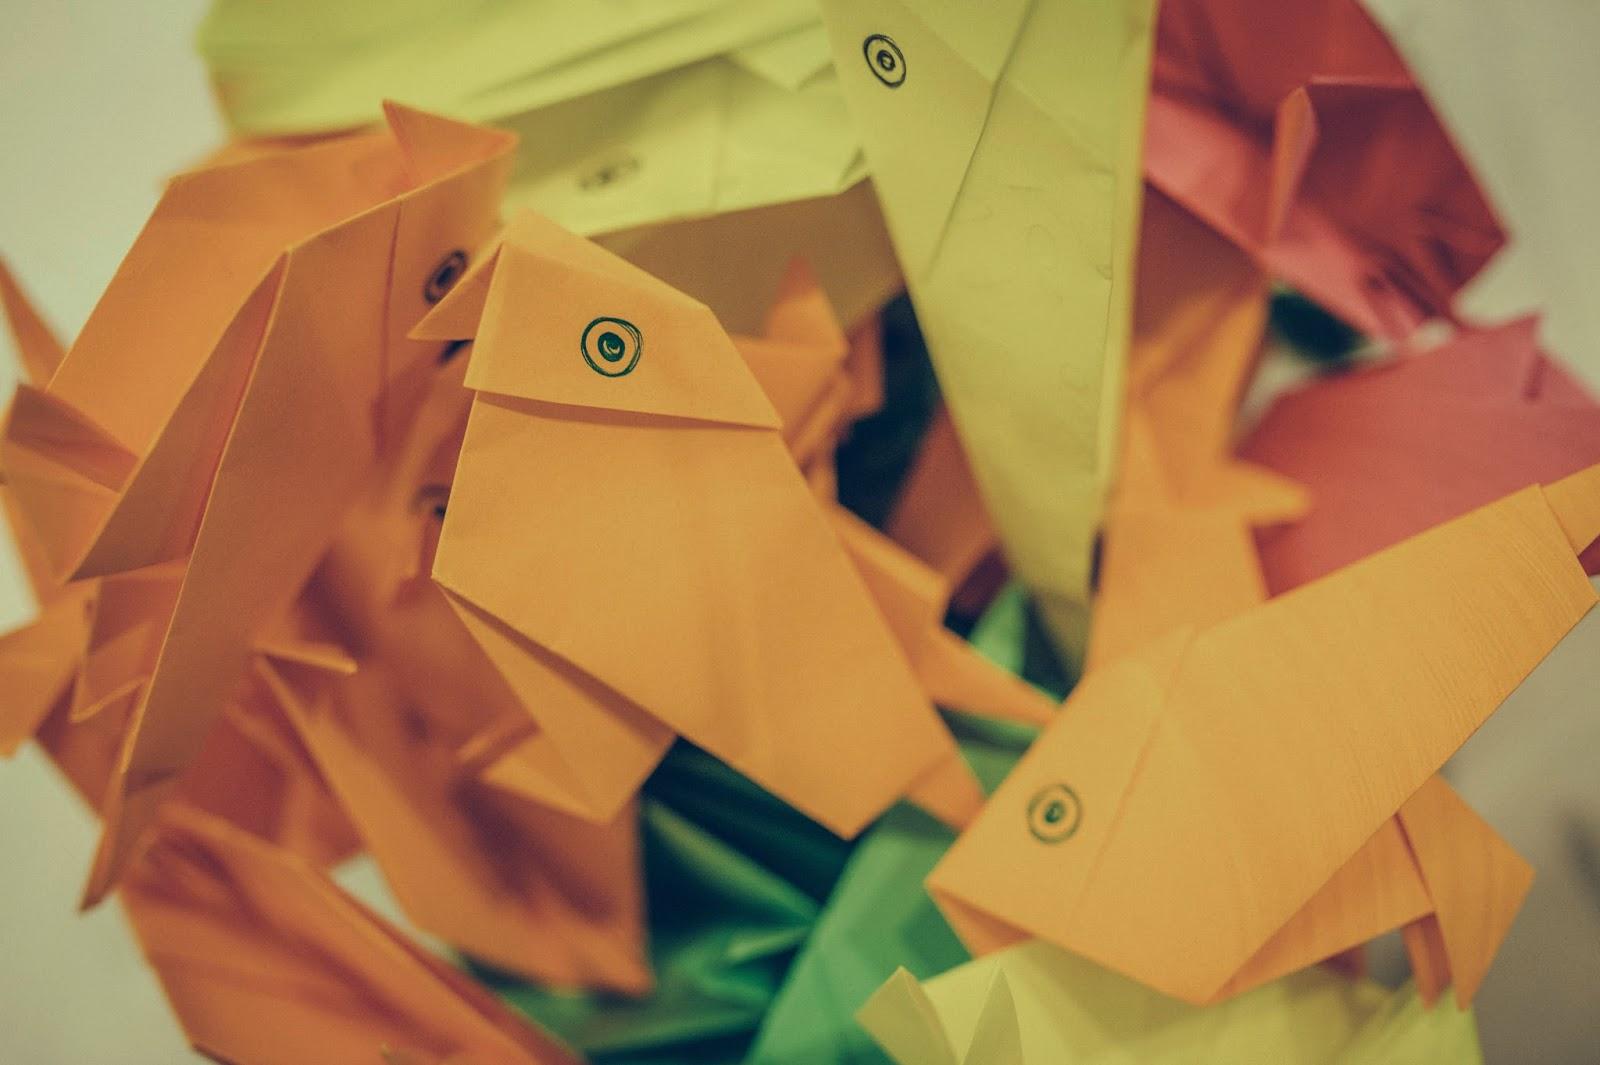 pajaritas de papel